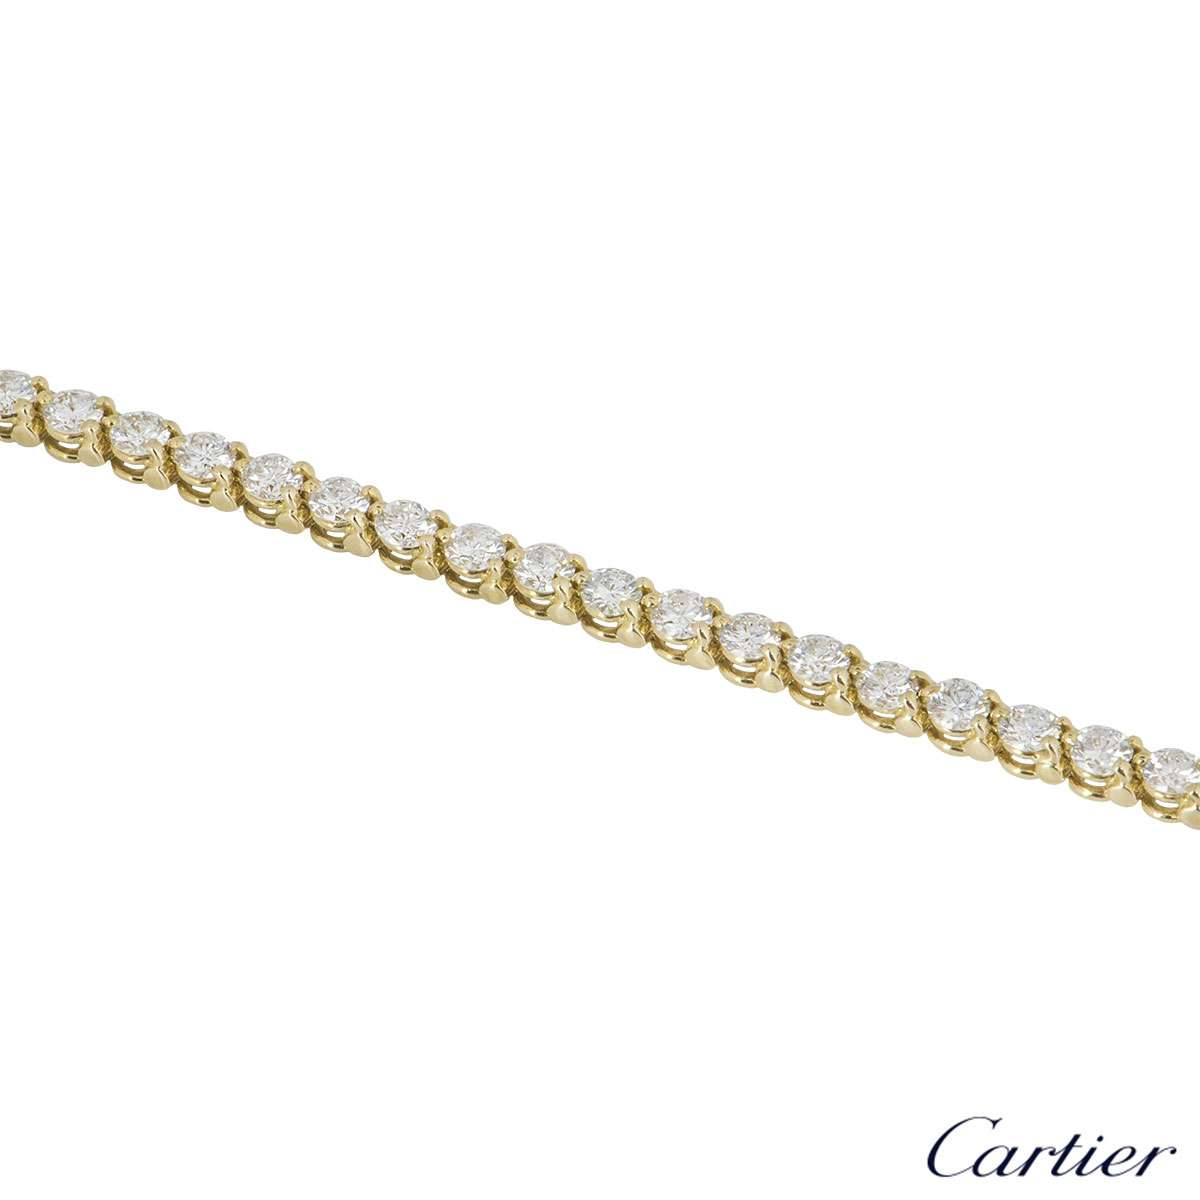 Cartier Yellow Gold Diamond Line Bracelet